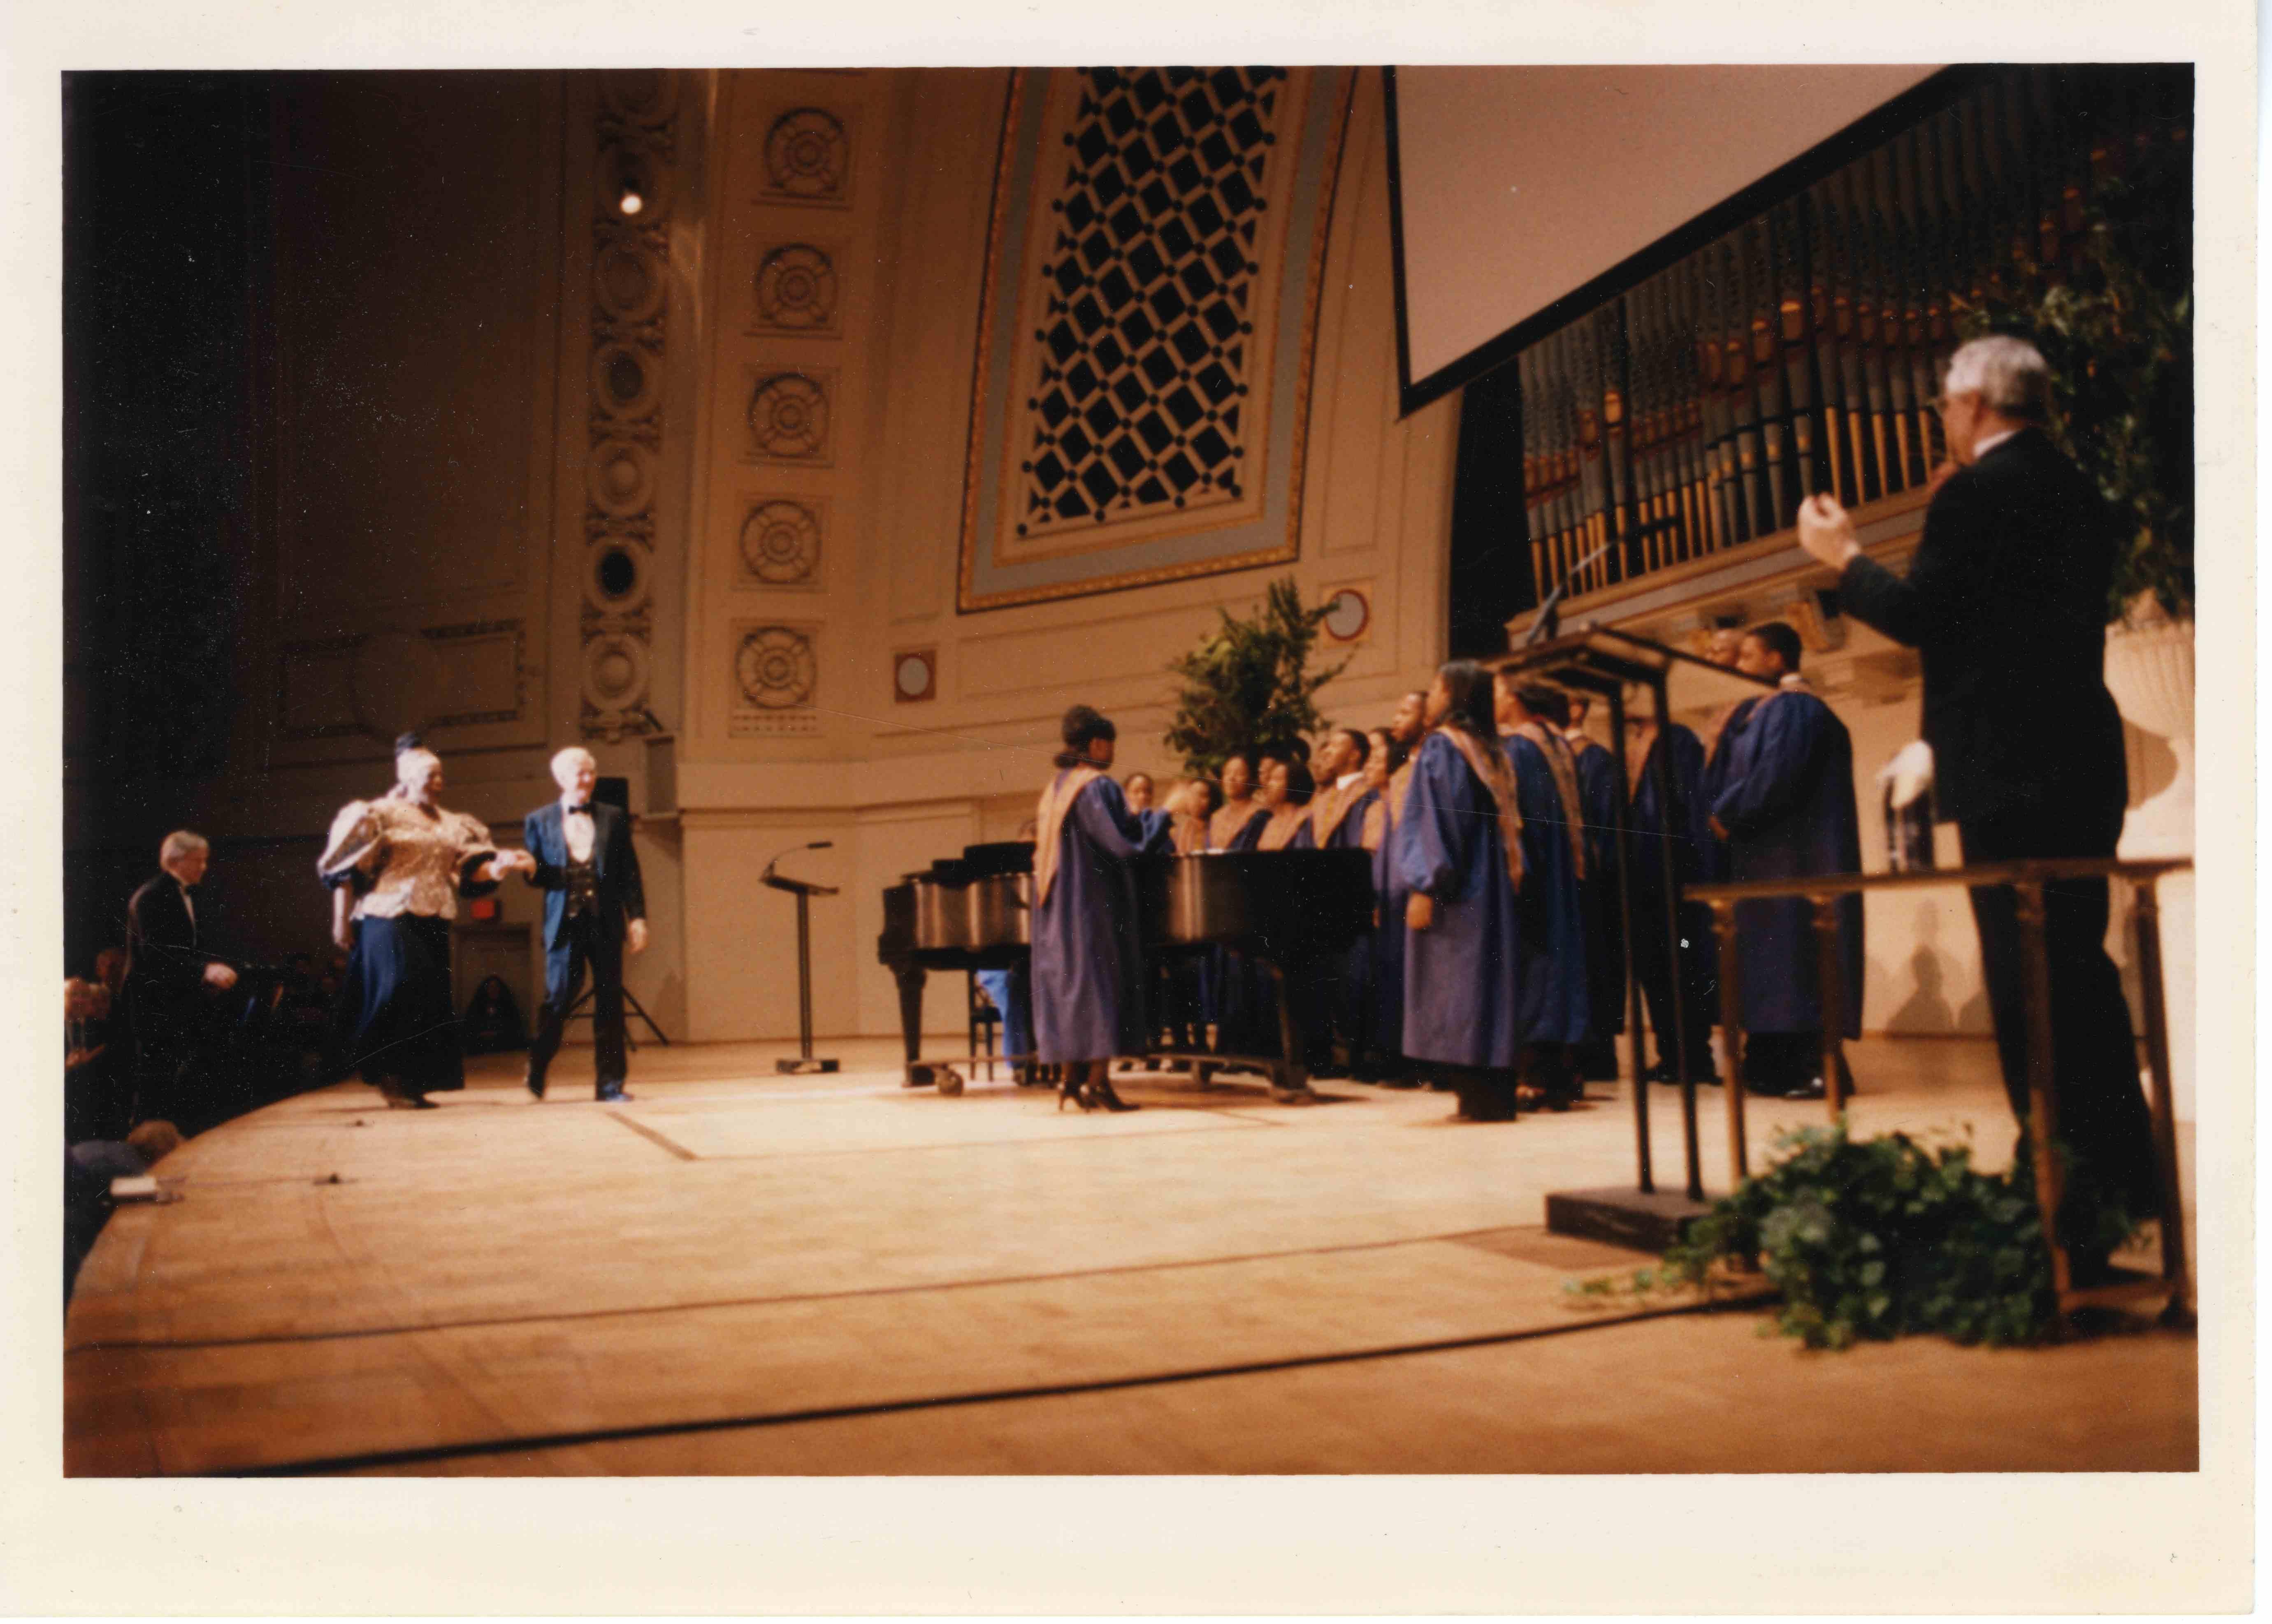 Ford Honors Program, April 26, 1997